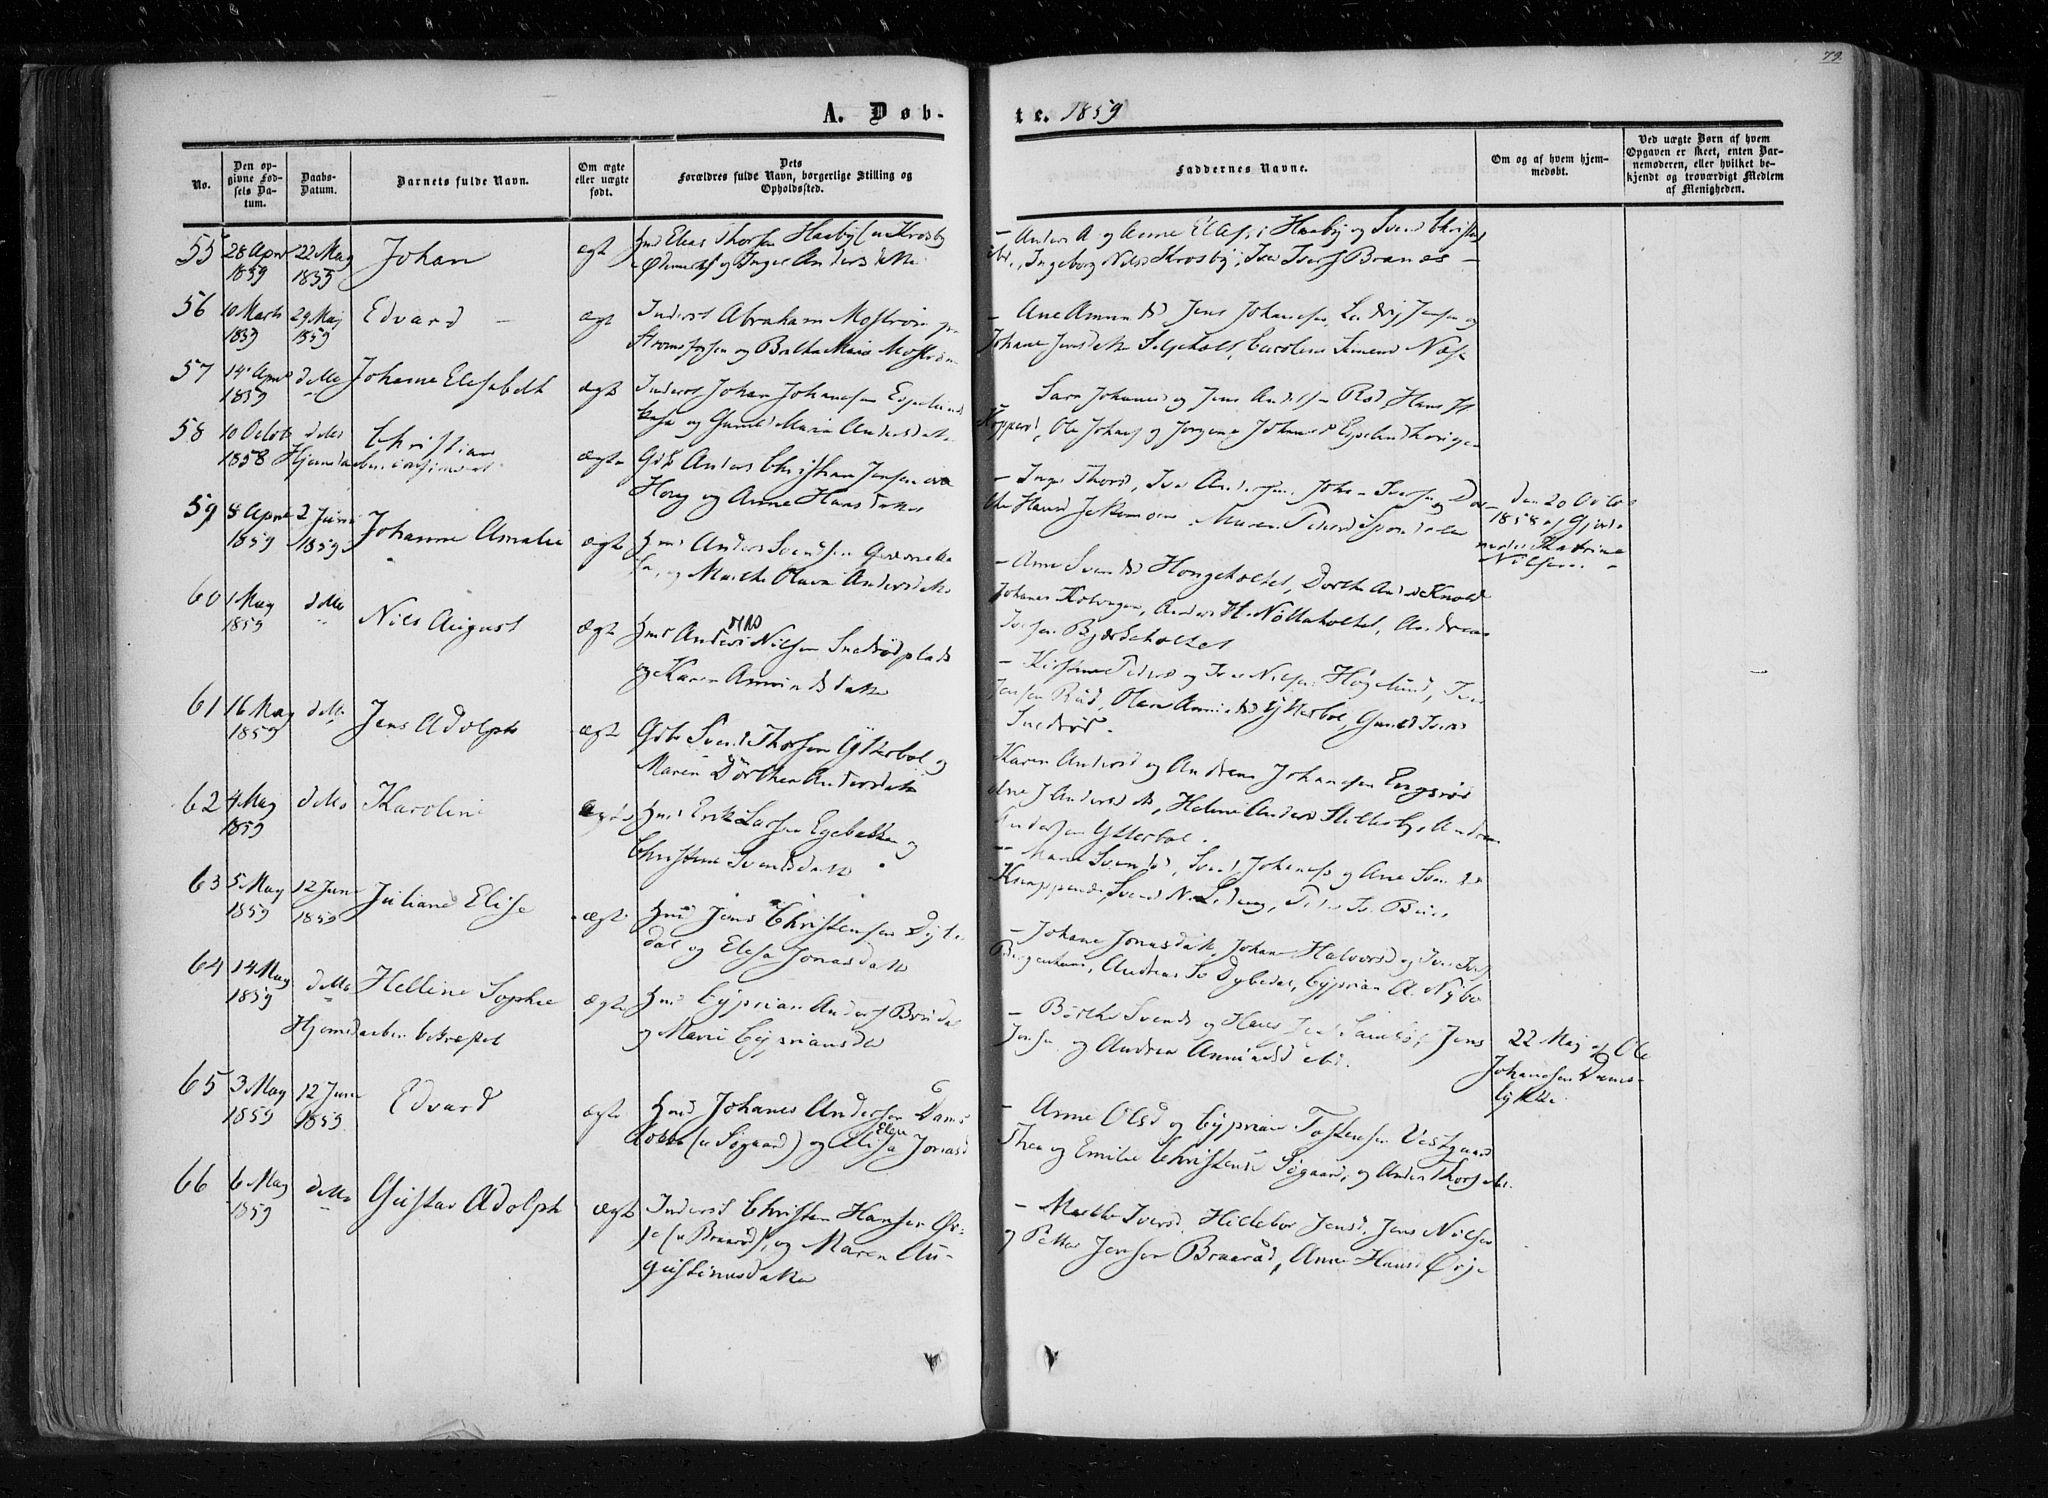 SAO, Aremark prestekontor Kirkebøker, F/Fc/L0003: Ministerialbok nr. III 3, 1850-1865, s. 79